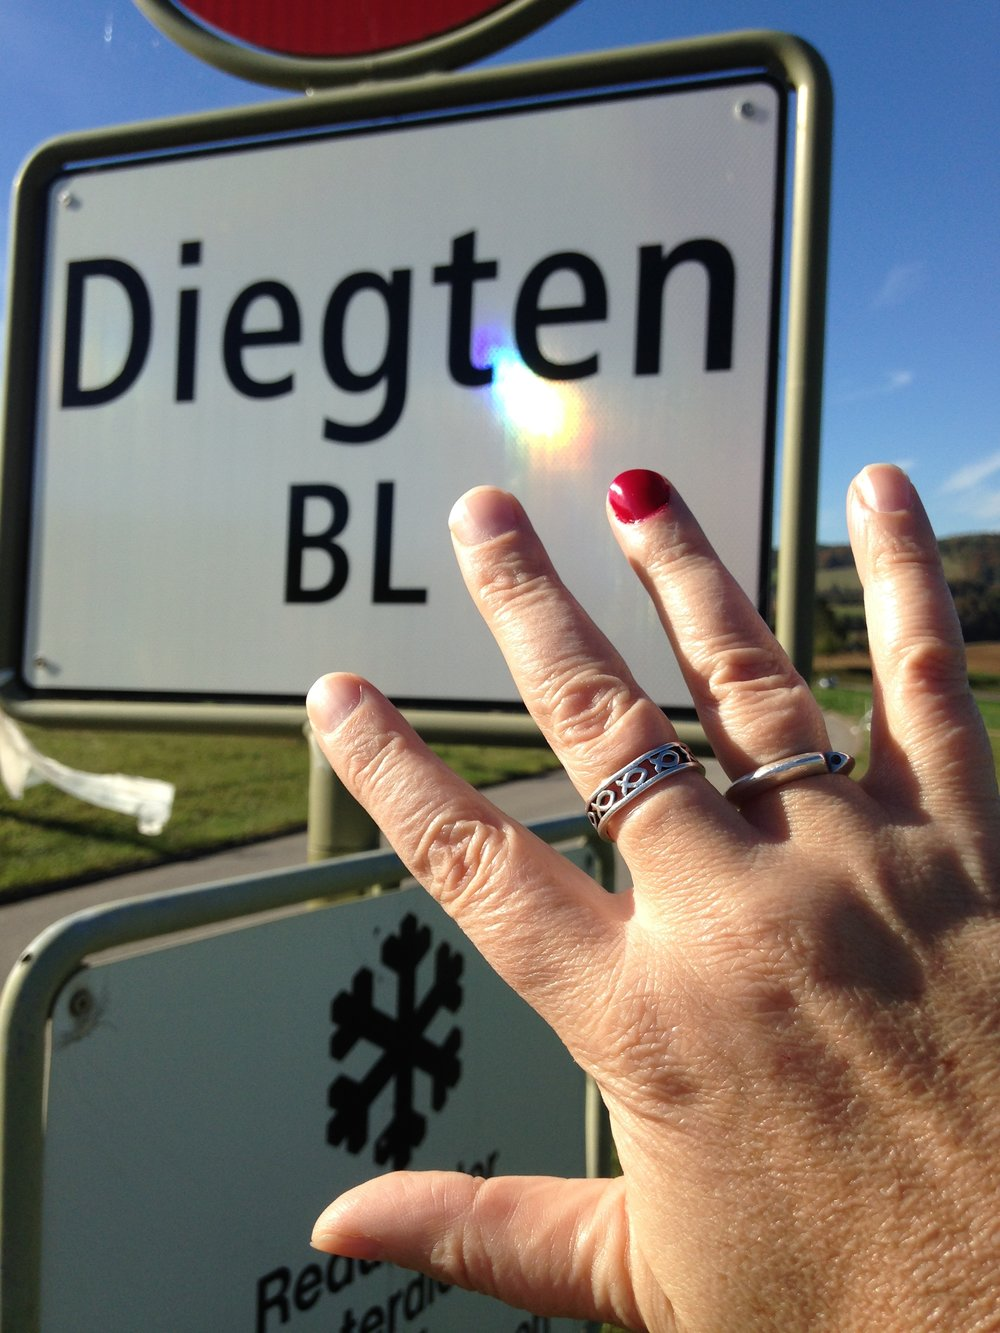 GABRIELA ROTH Leiterin Administration     BEUNLIMITED     Lood 207b 3803 Beatenberg    Switzerland        Phone: +41 77 435 85 20    Kummer Nummer: 0800 66 99 11        www.beunlimited.org[1]    gabriela.roth@beunlimited.org[2]        Links: ------ [1] http://www.beunlimited.org/ [2]